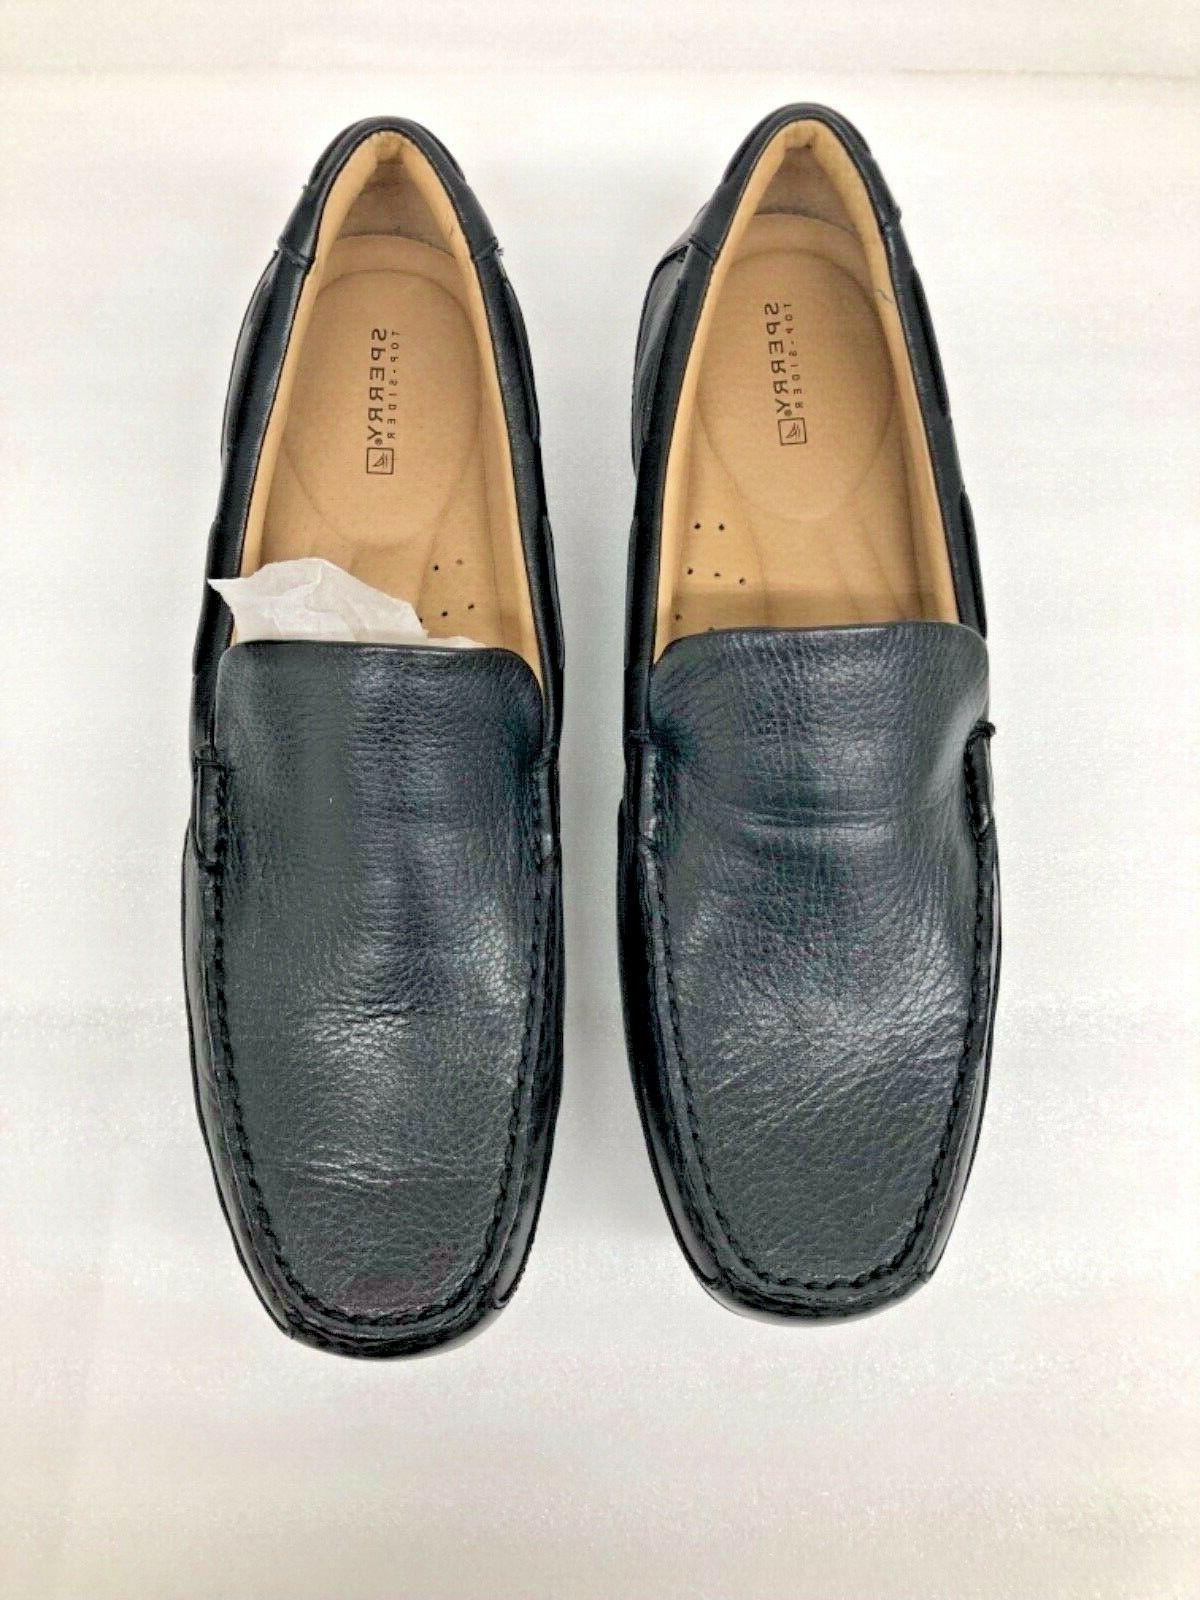 Sperry Top-Sider Navigator $90 Loafer Shoes Size